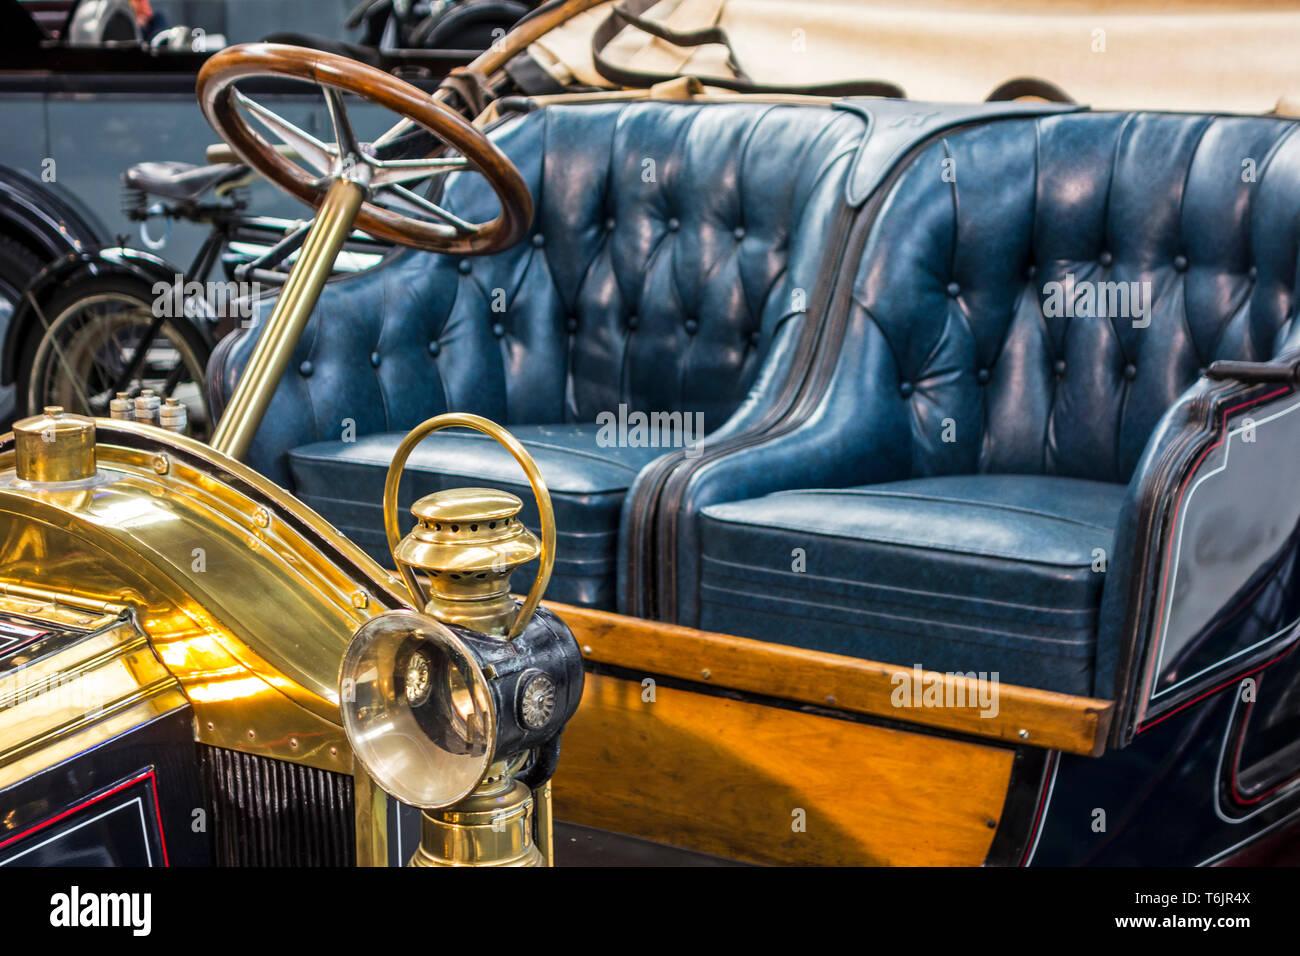 Kerosene oil headlamp of 1909 Renault Type AX, classic automobile / oldtimer / antique vehicle at Autoworld, vintage car museum in Brussels, Belgium - Stock Image